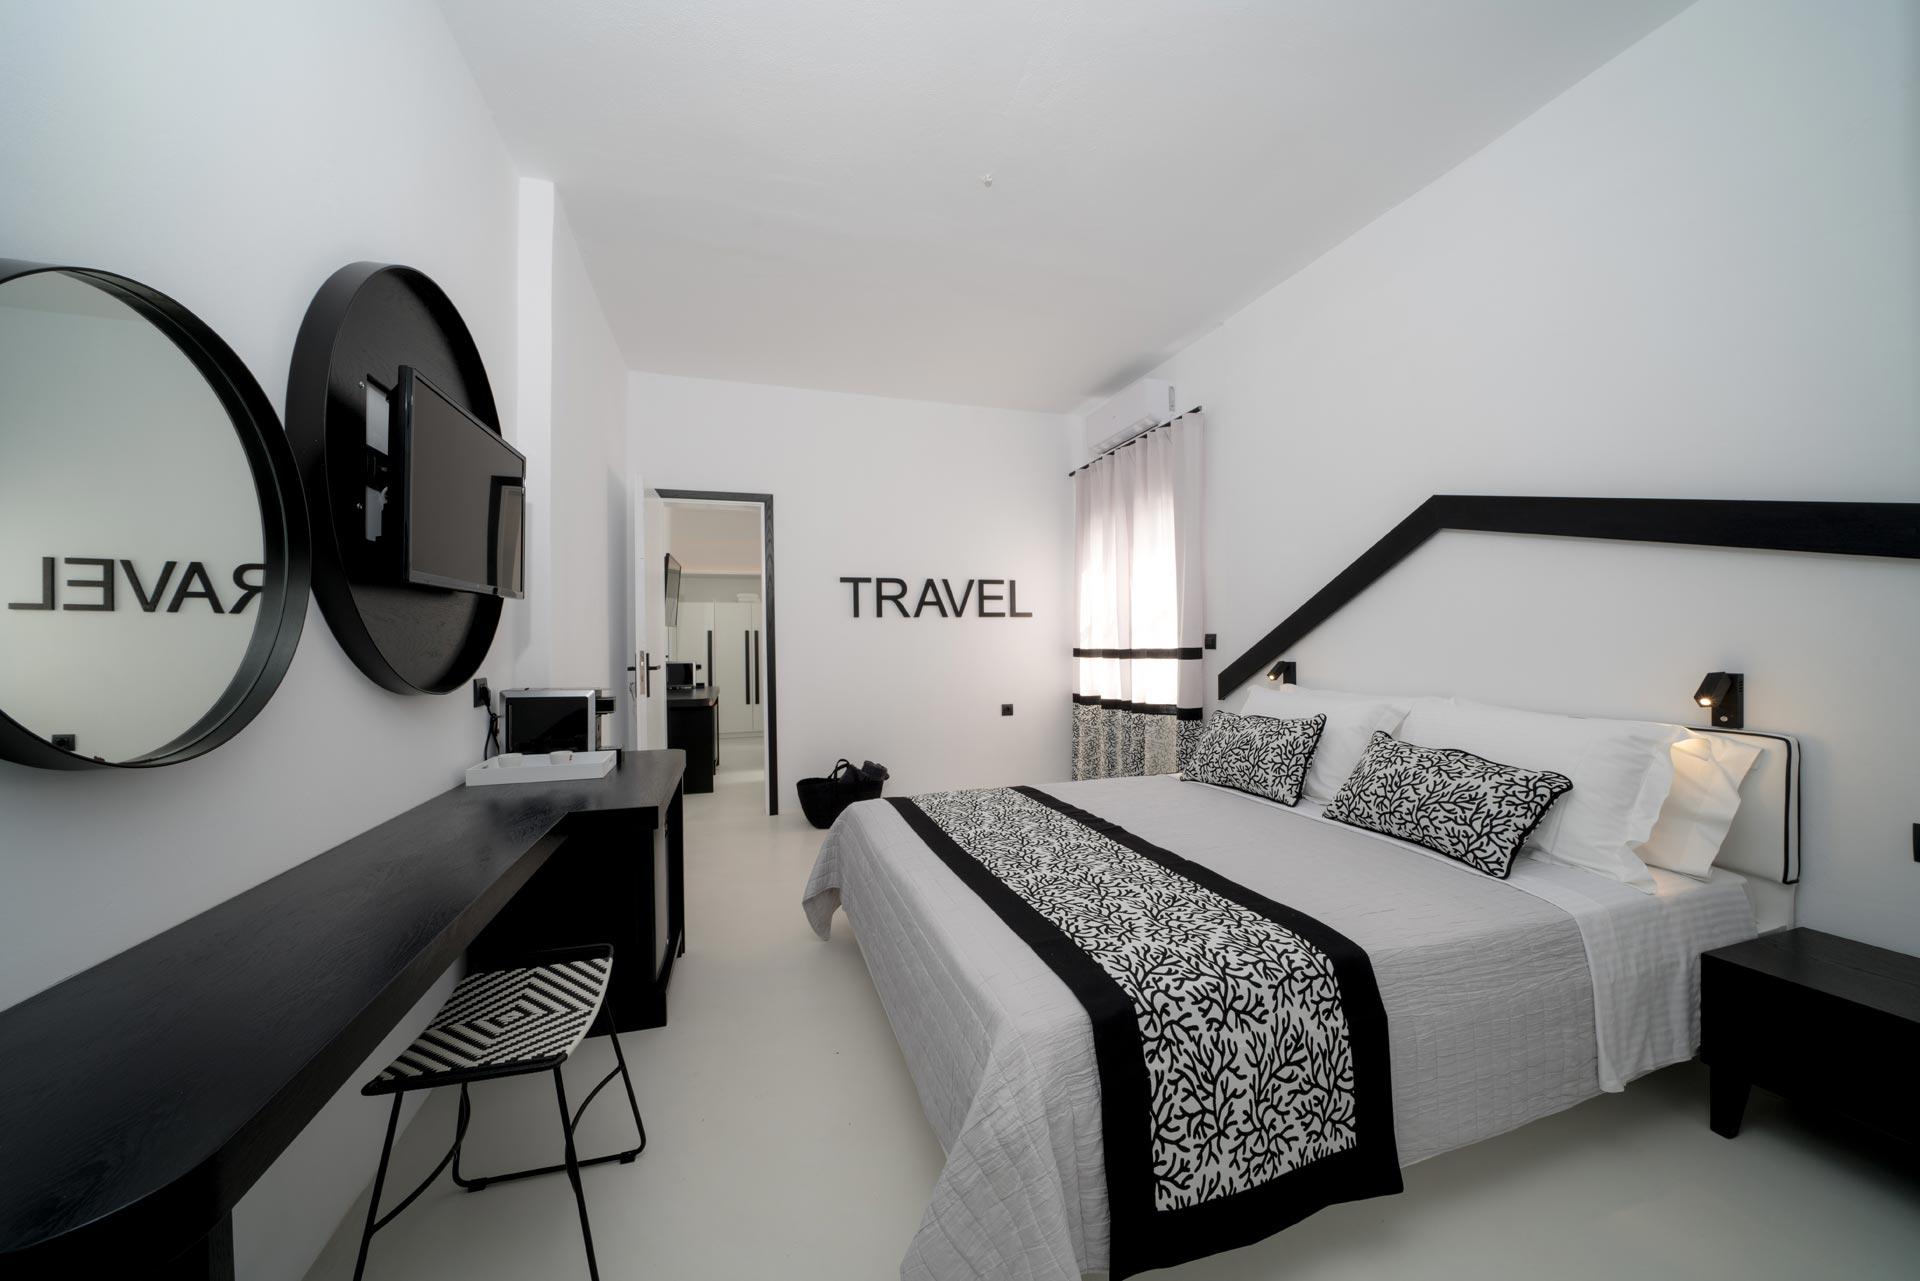 divelia-hotel-family-dream-room